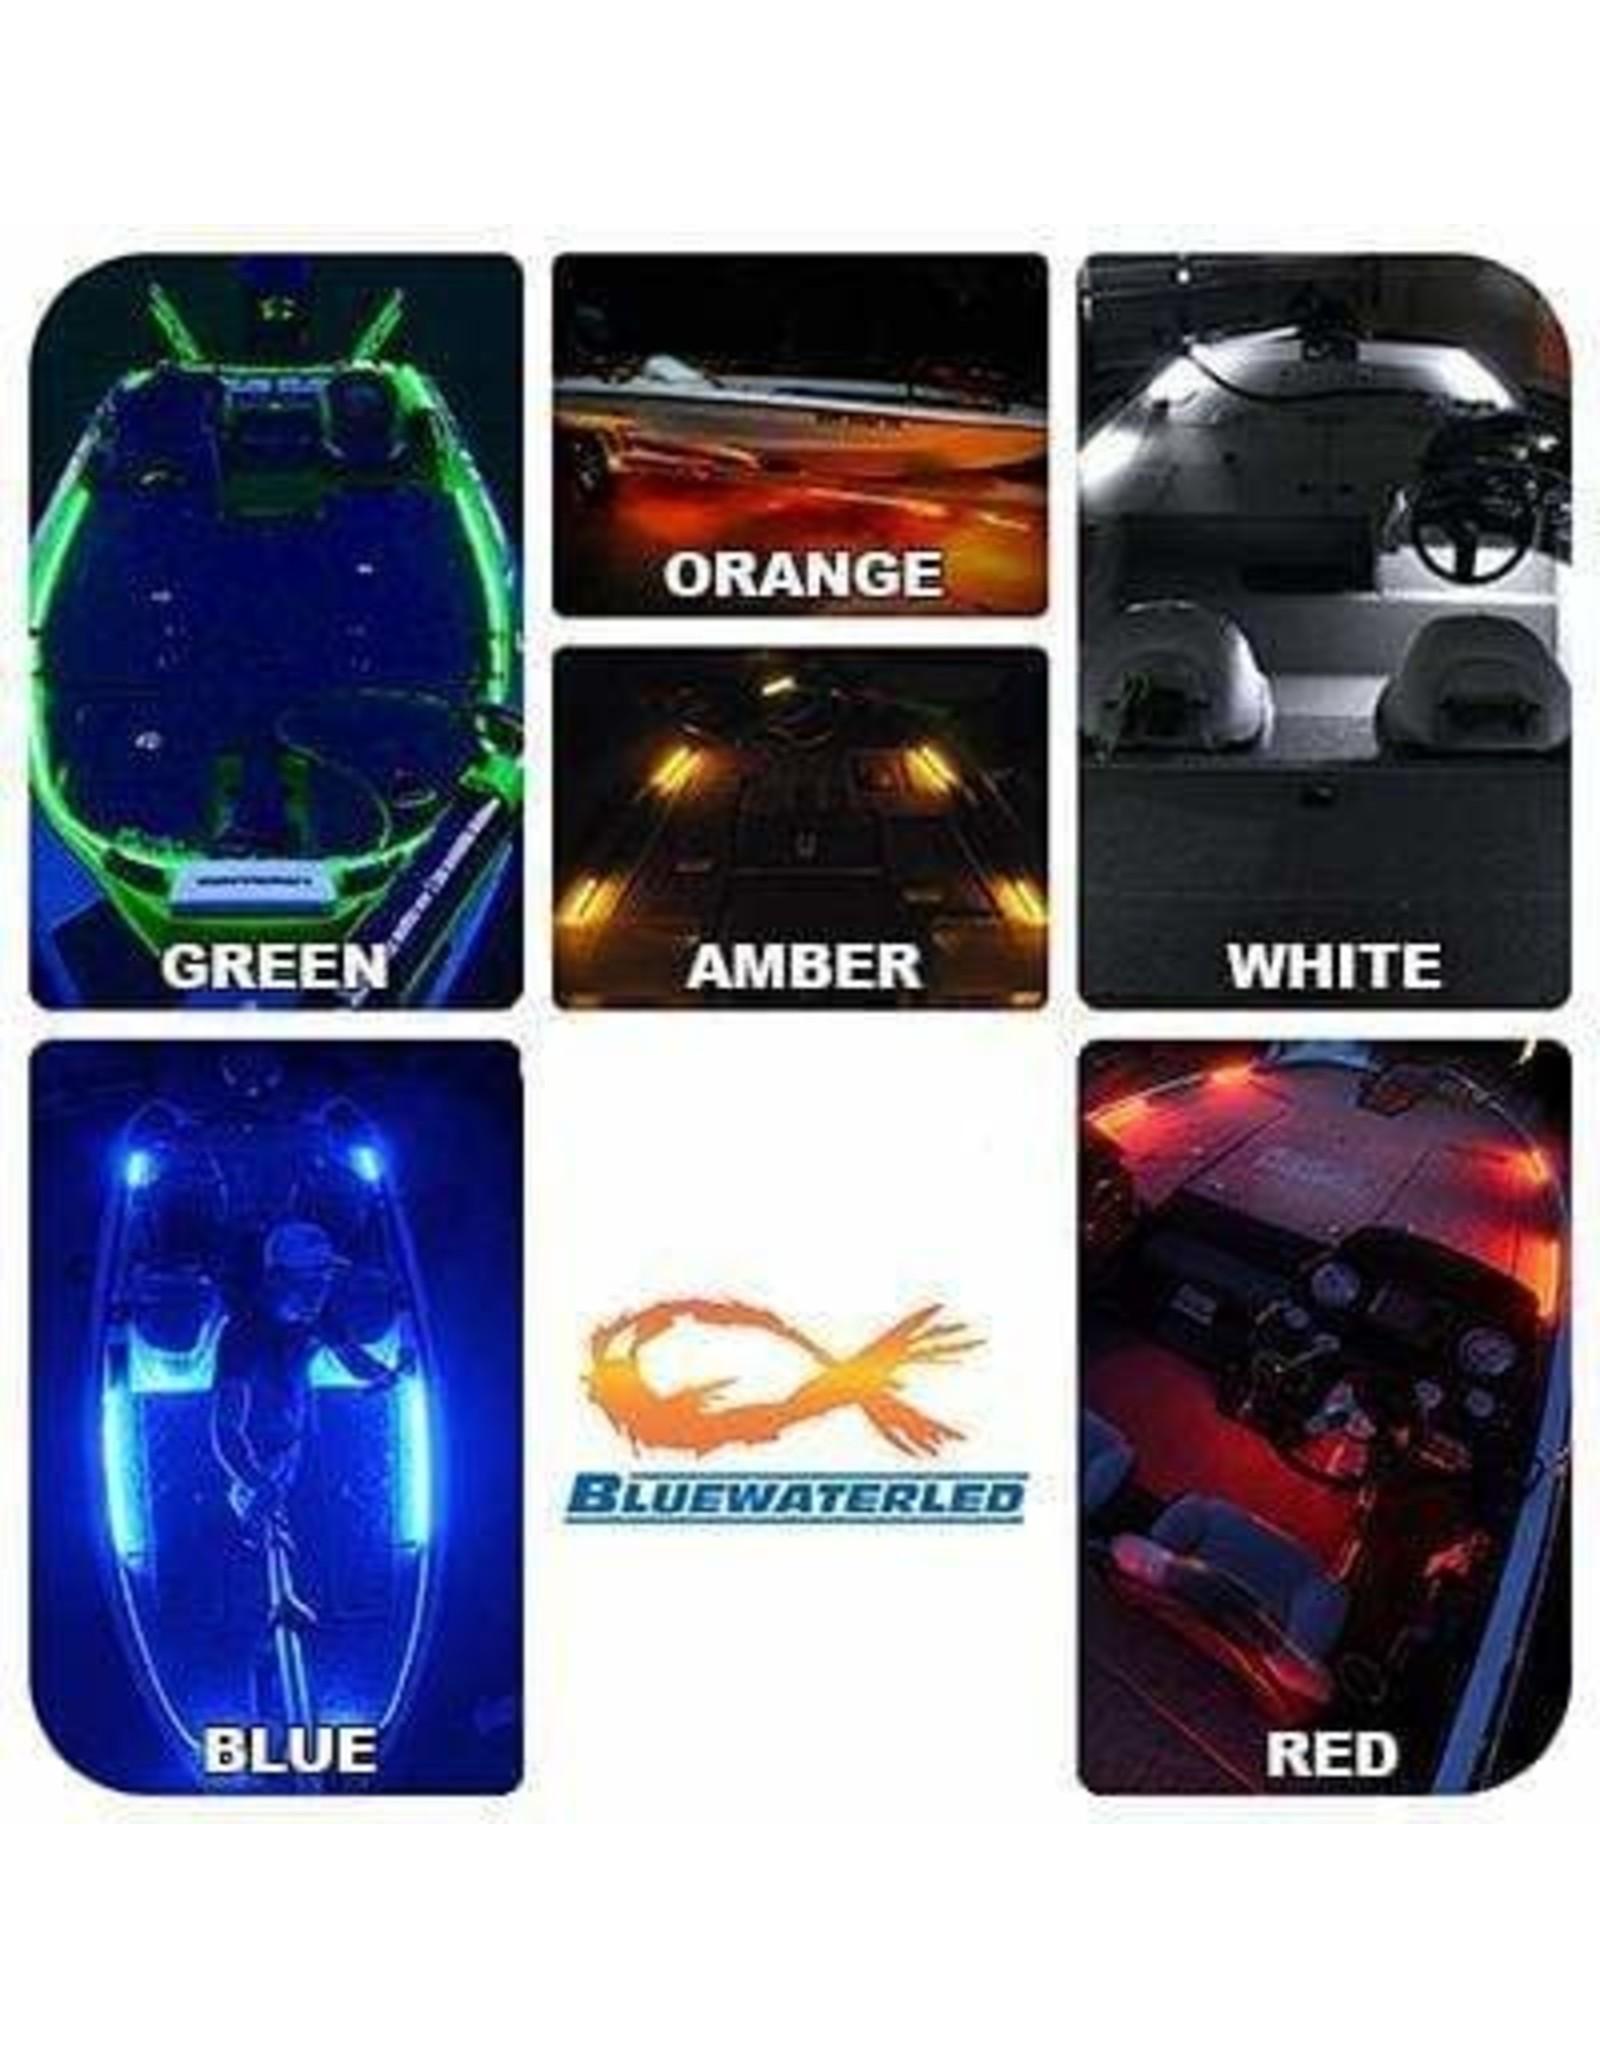 Blue Water LED Bluewater Night Blaster Deck Light Kits